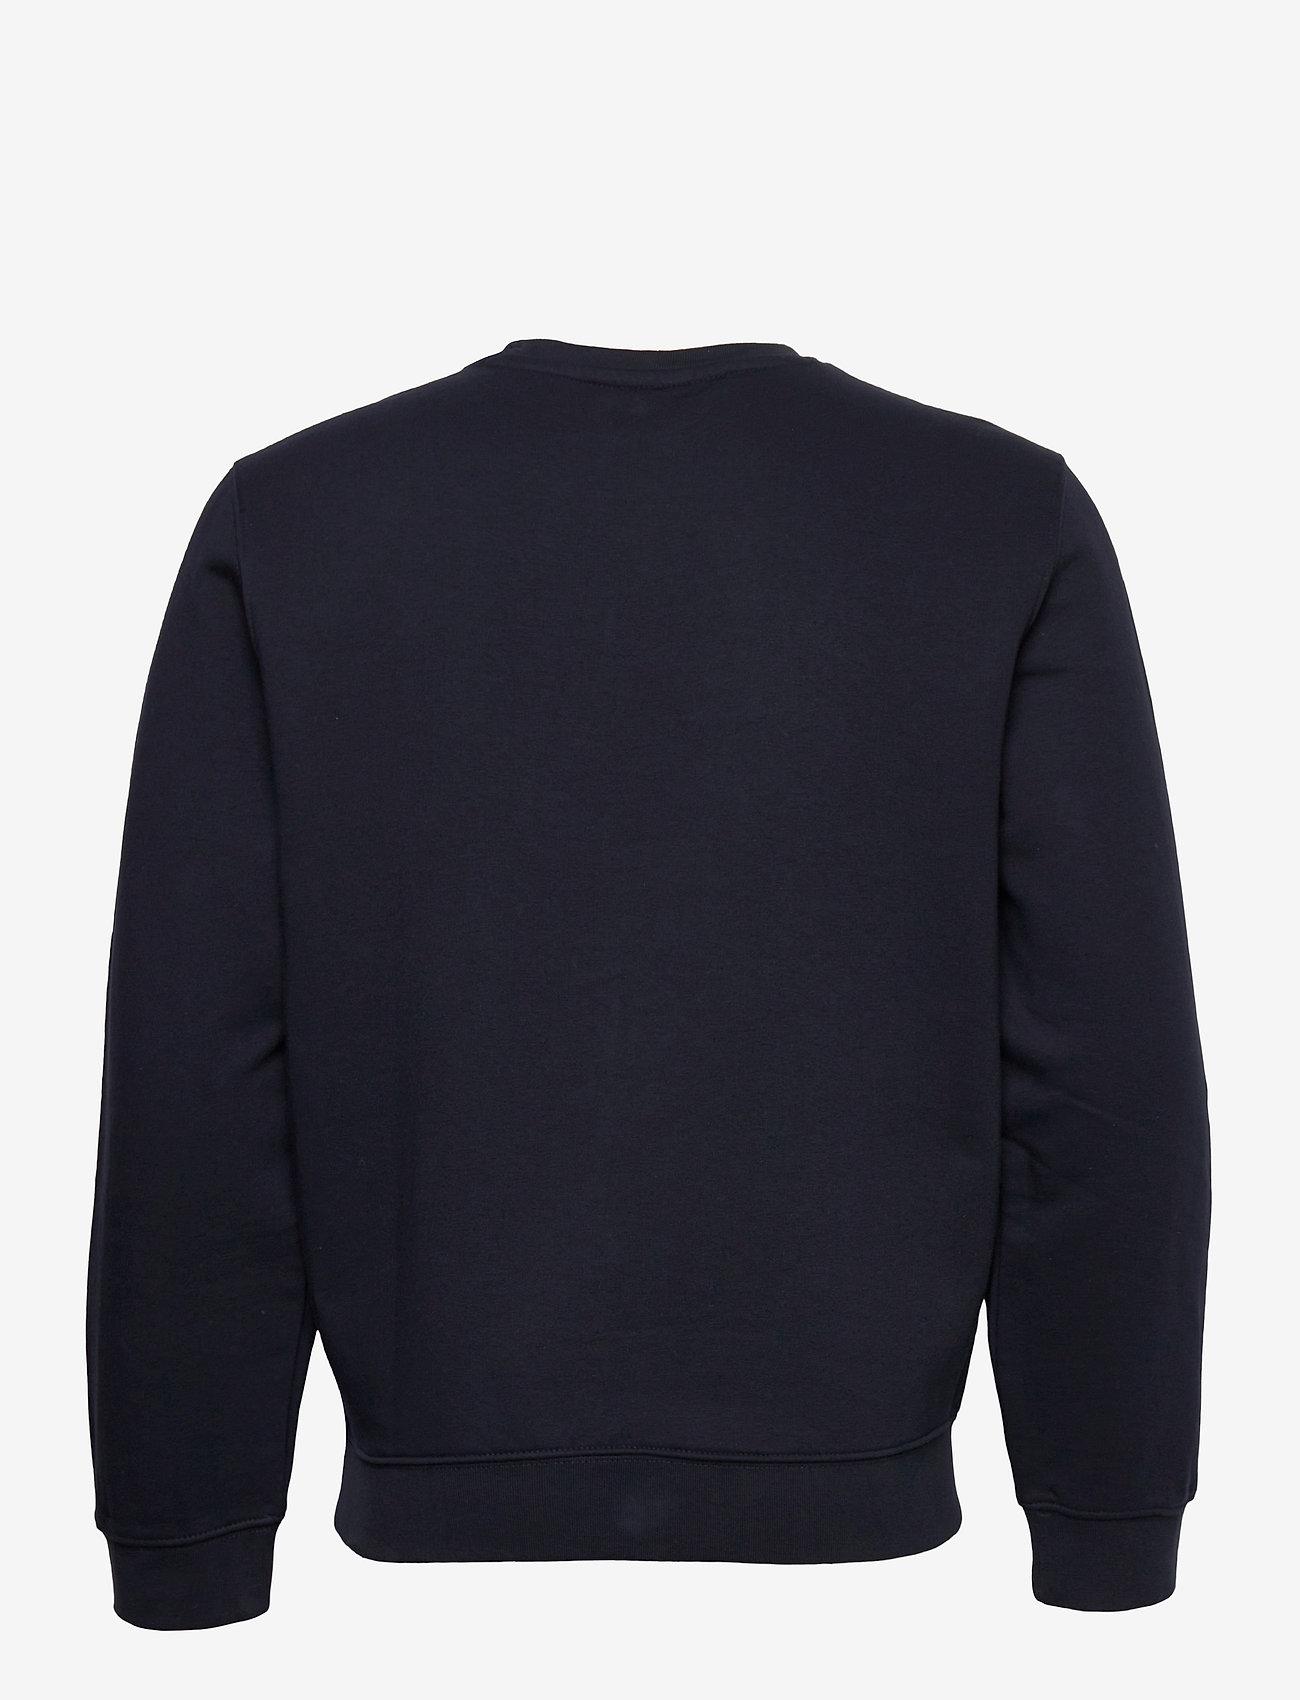 Champion Crewneck Sweatshirt - Sweatshirts SKY CAPTAIN - Menn Klær